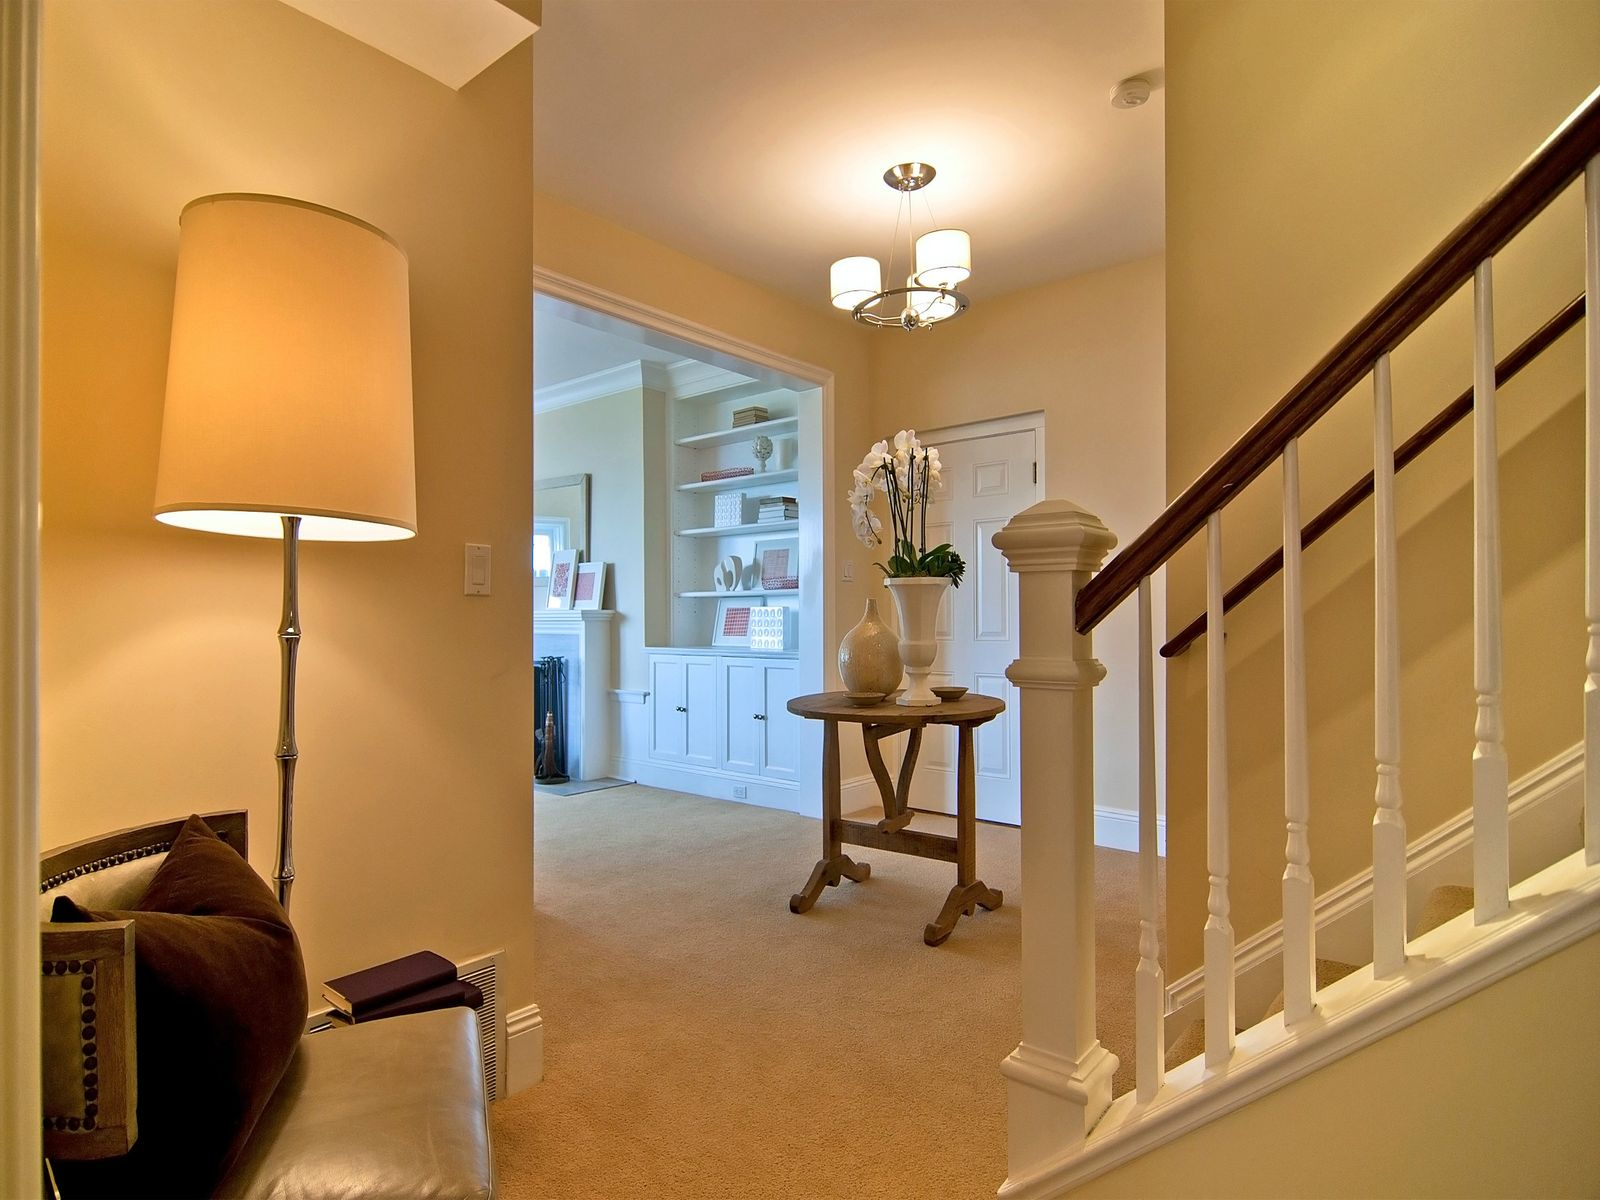 Classic Renovated, House-Like Condo